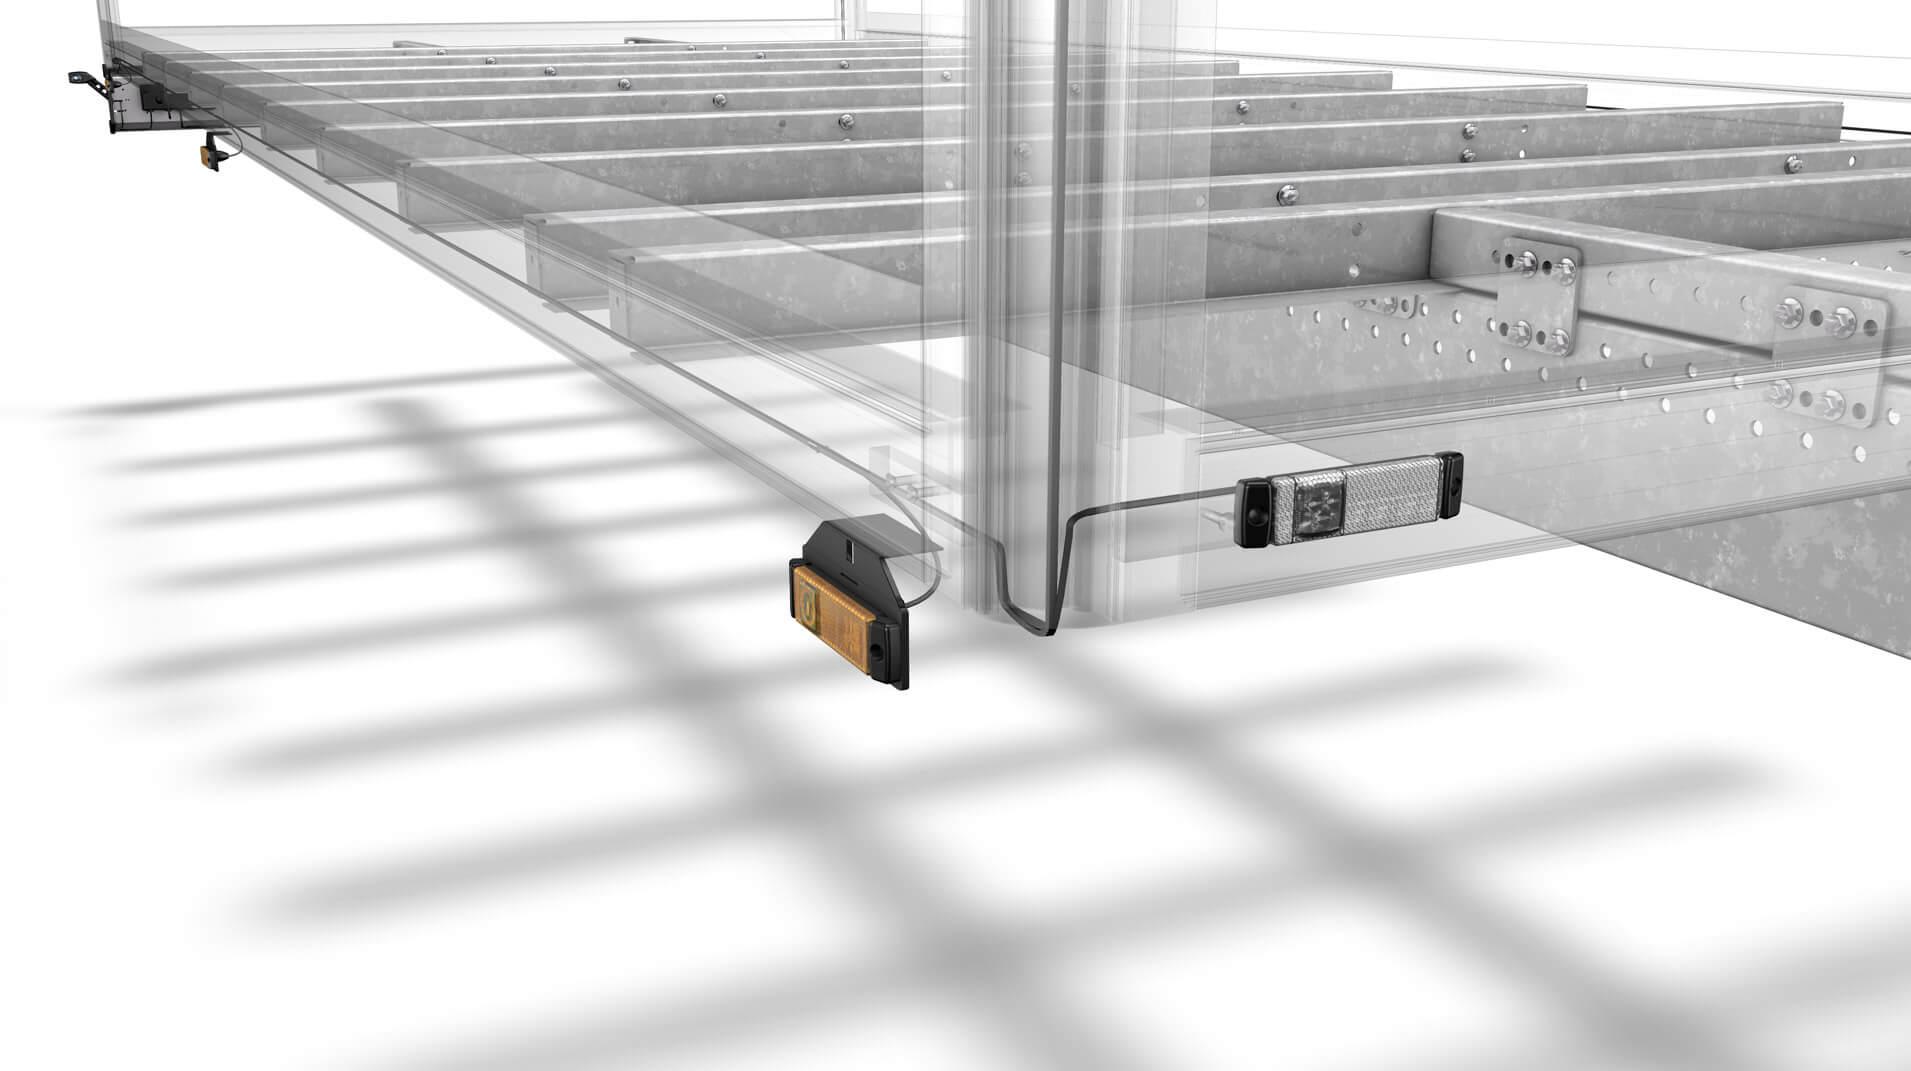 3D Animation Titgemeyer Kofferbausatz Licht Verkabelung - aixwave.com